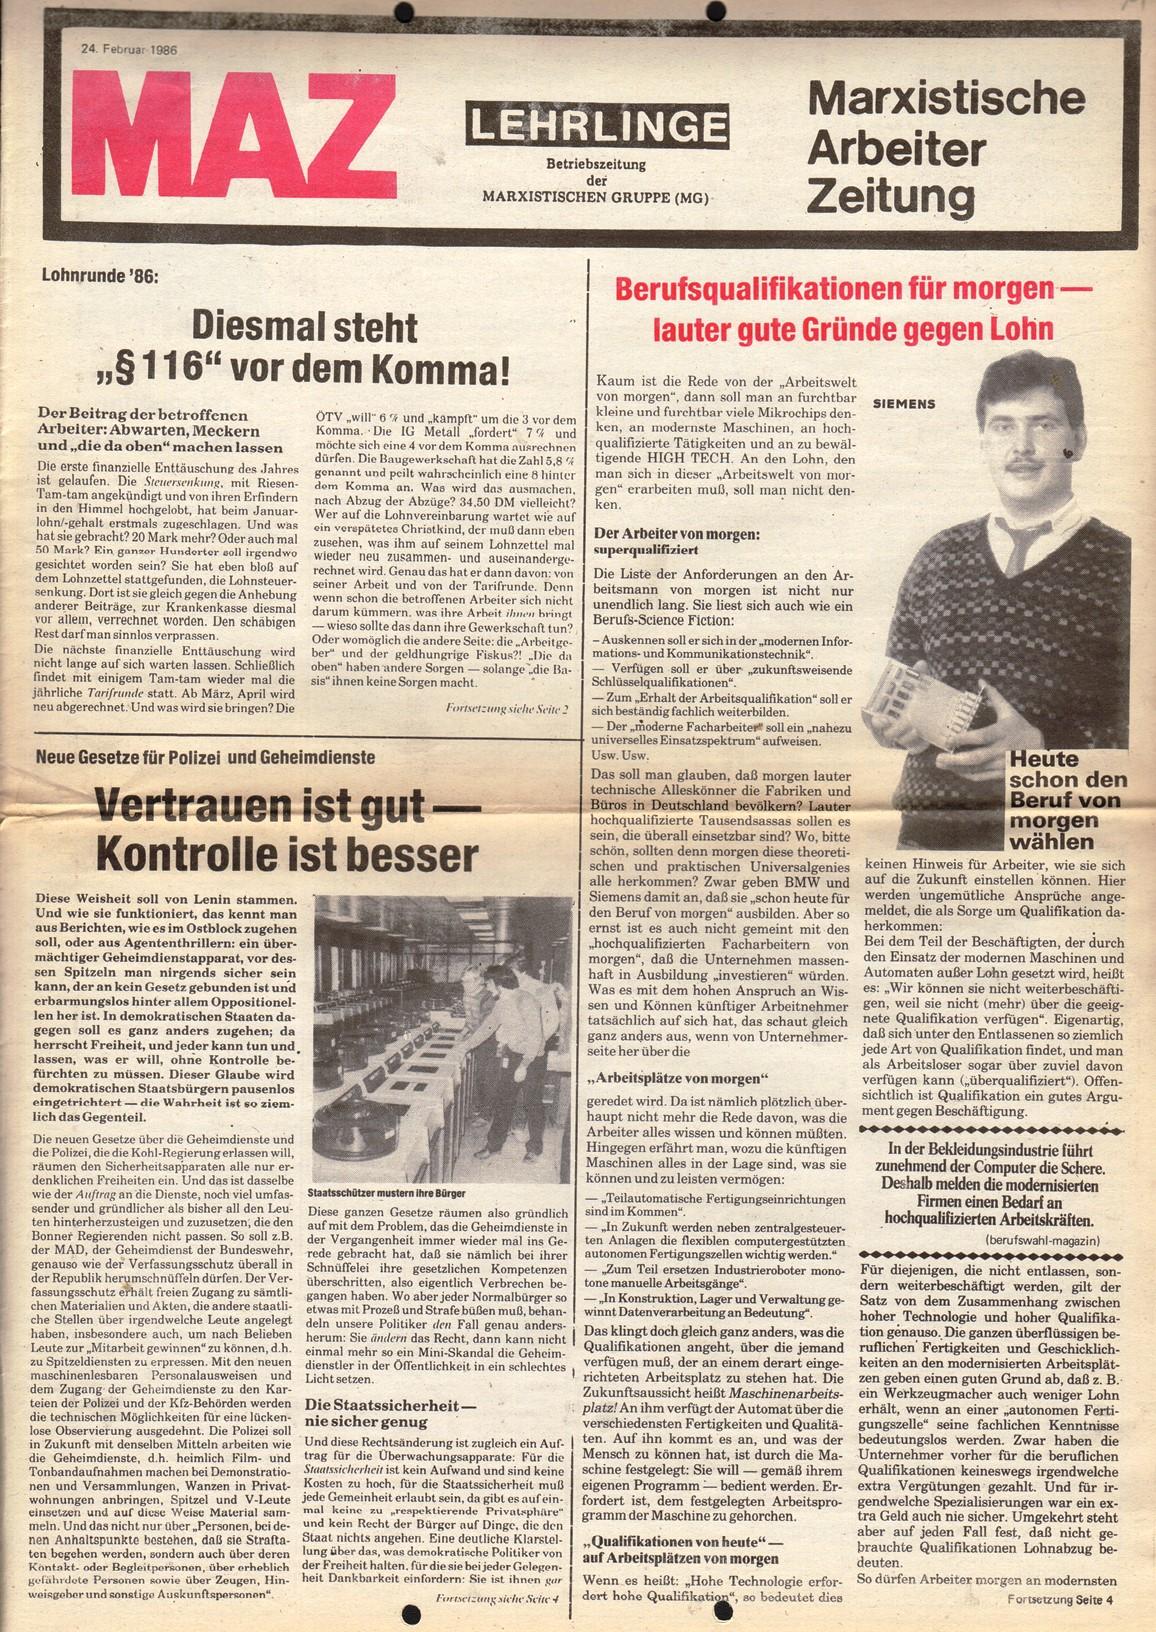 Muenchen_MG_MAZ_Lehrlinge_19860224_01